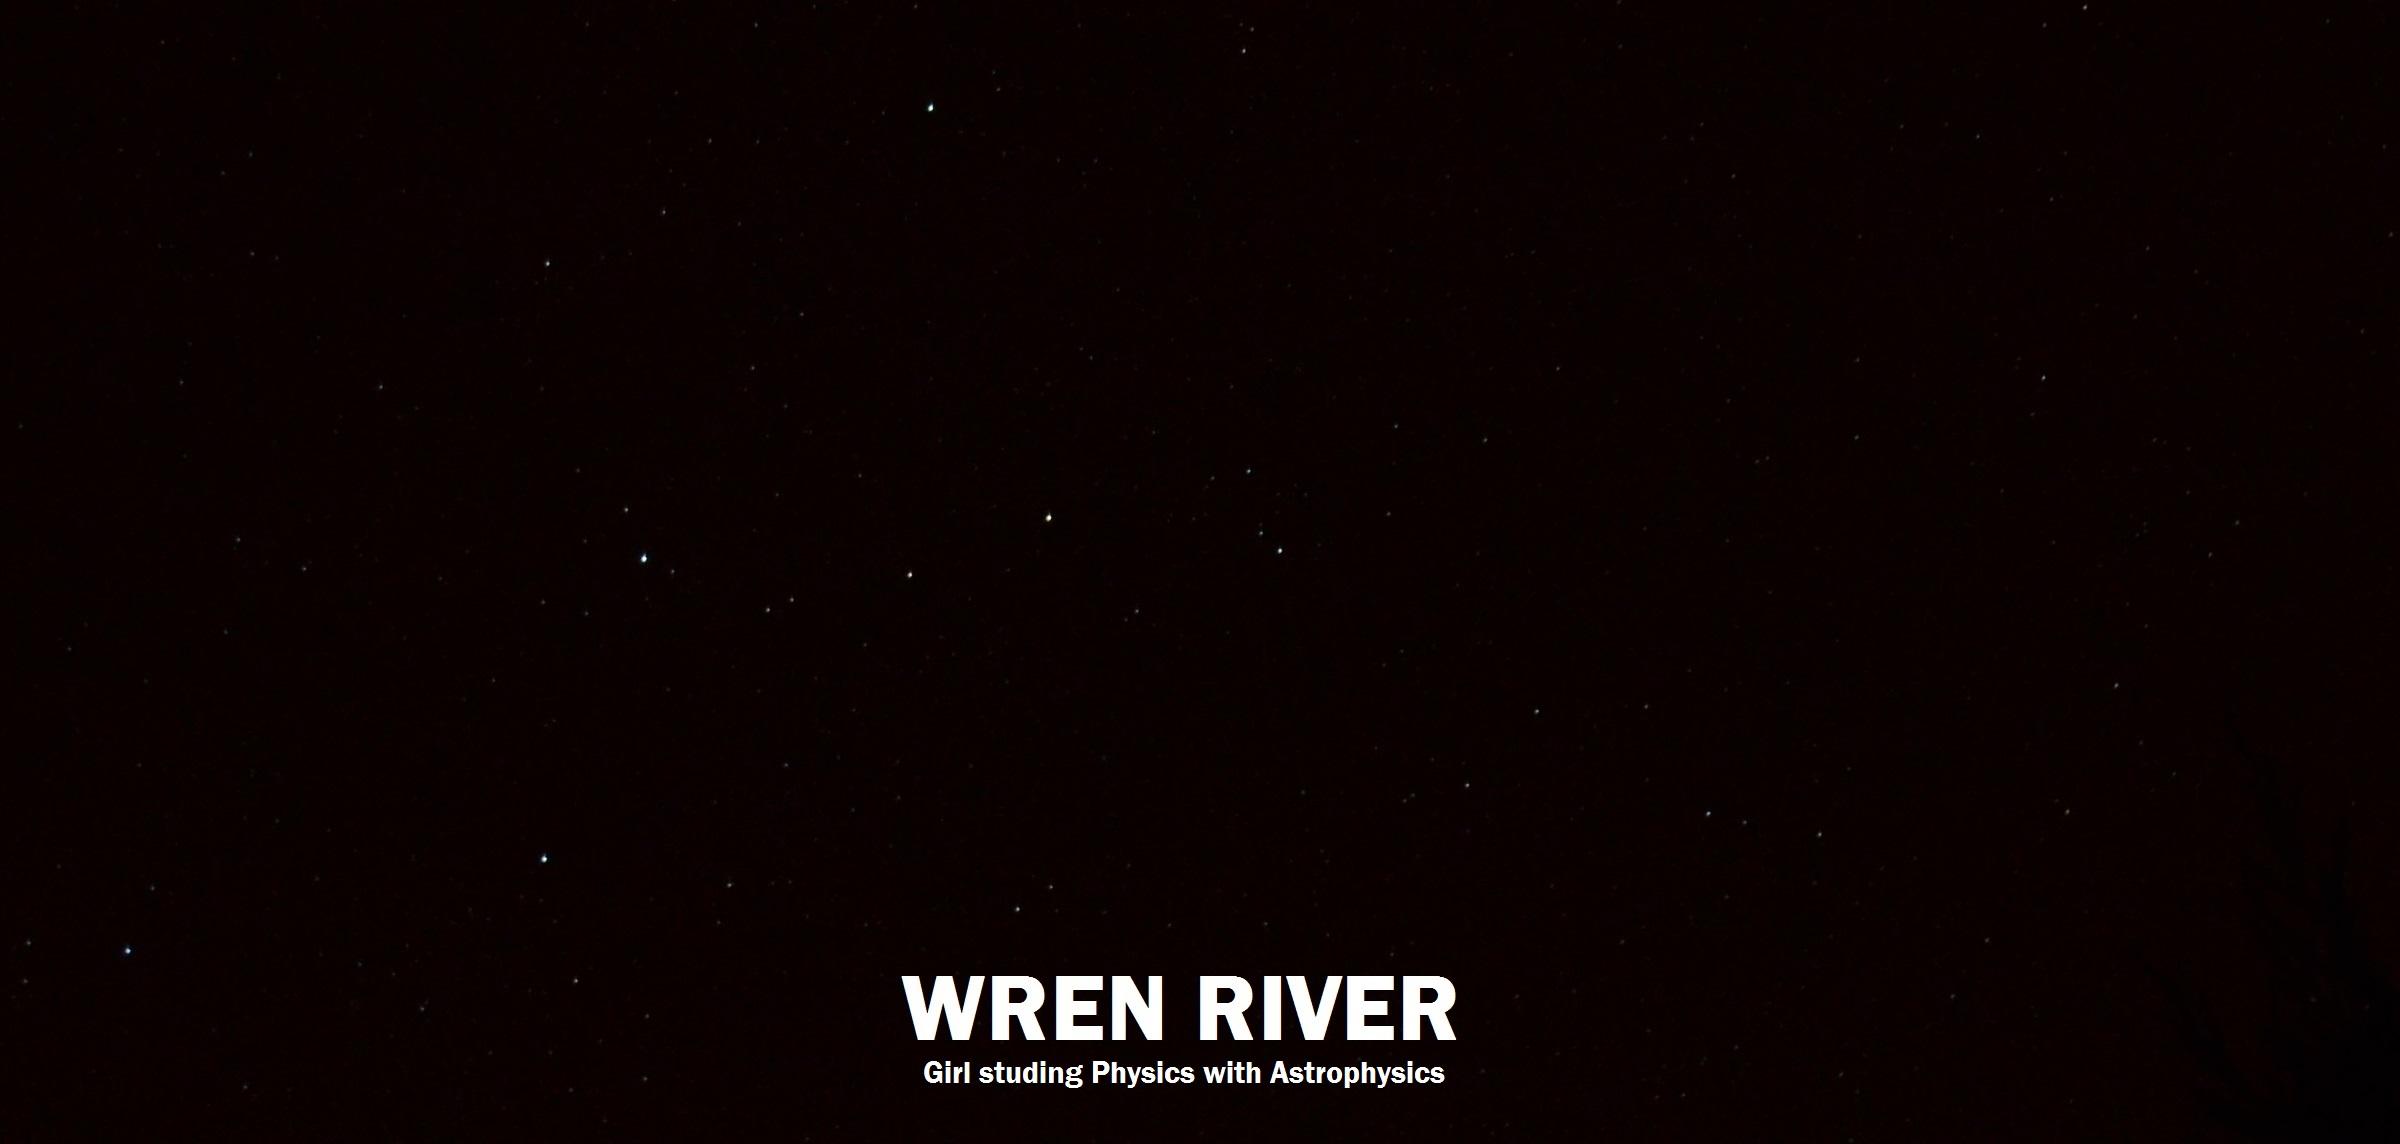 Wren River